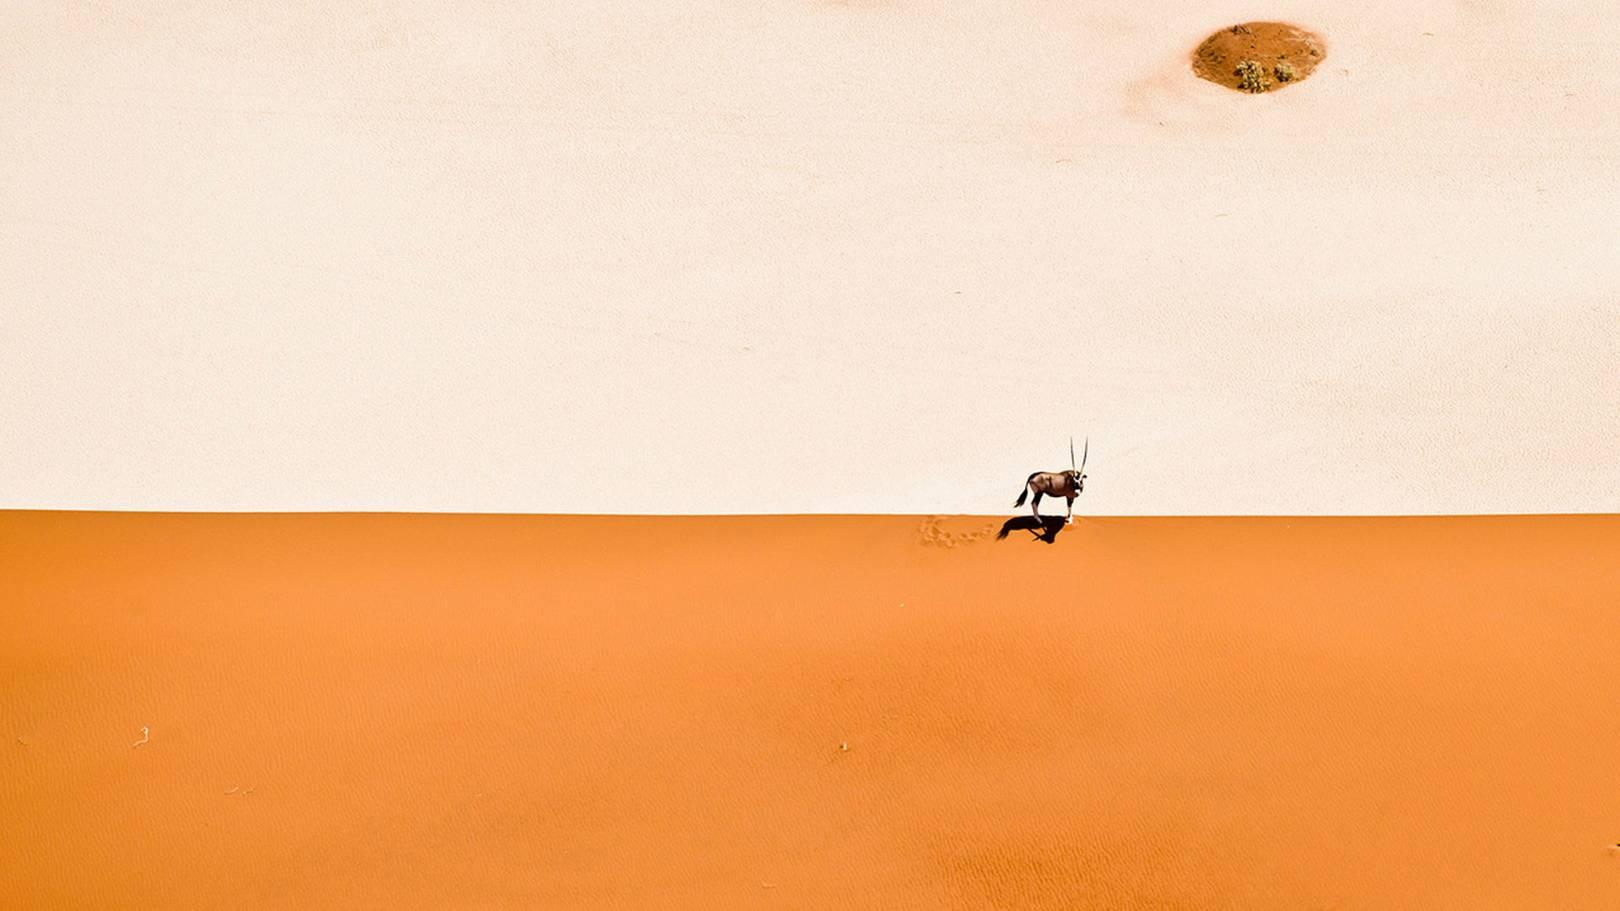 Behind the scenes of photographer David Yarrow's wildlife shots